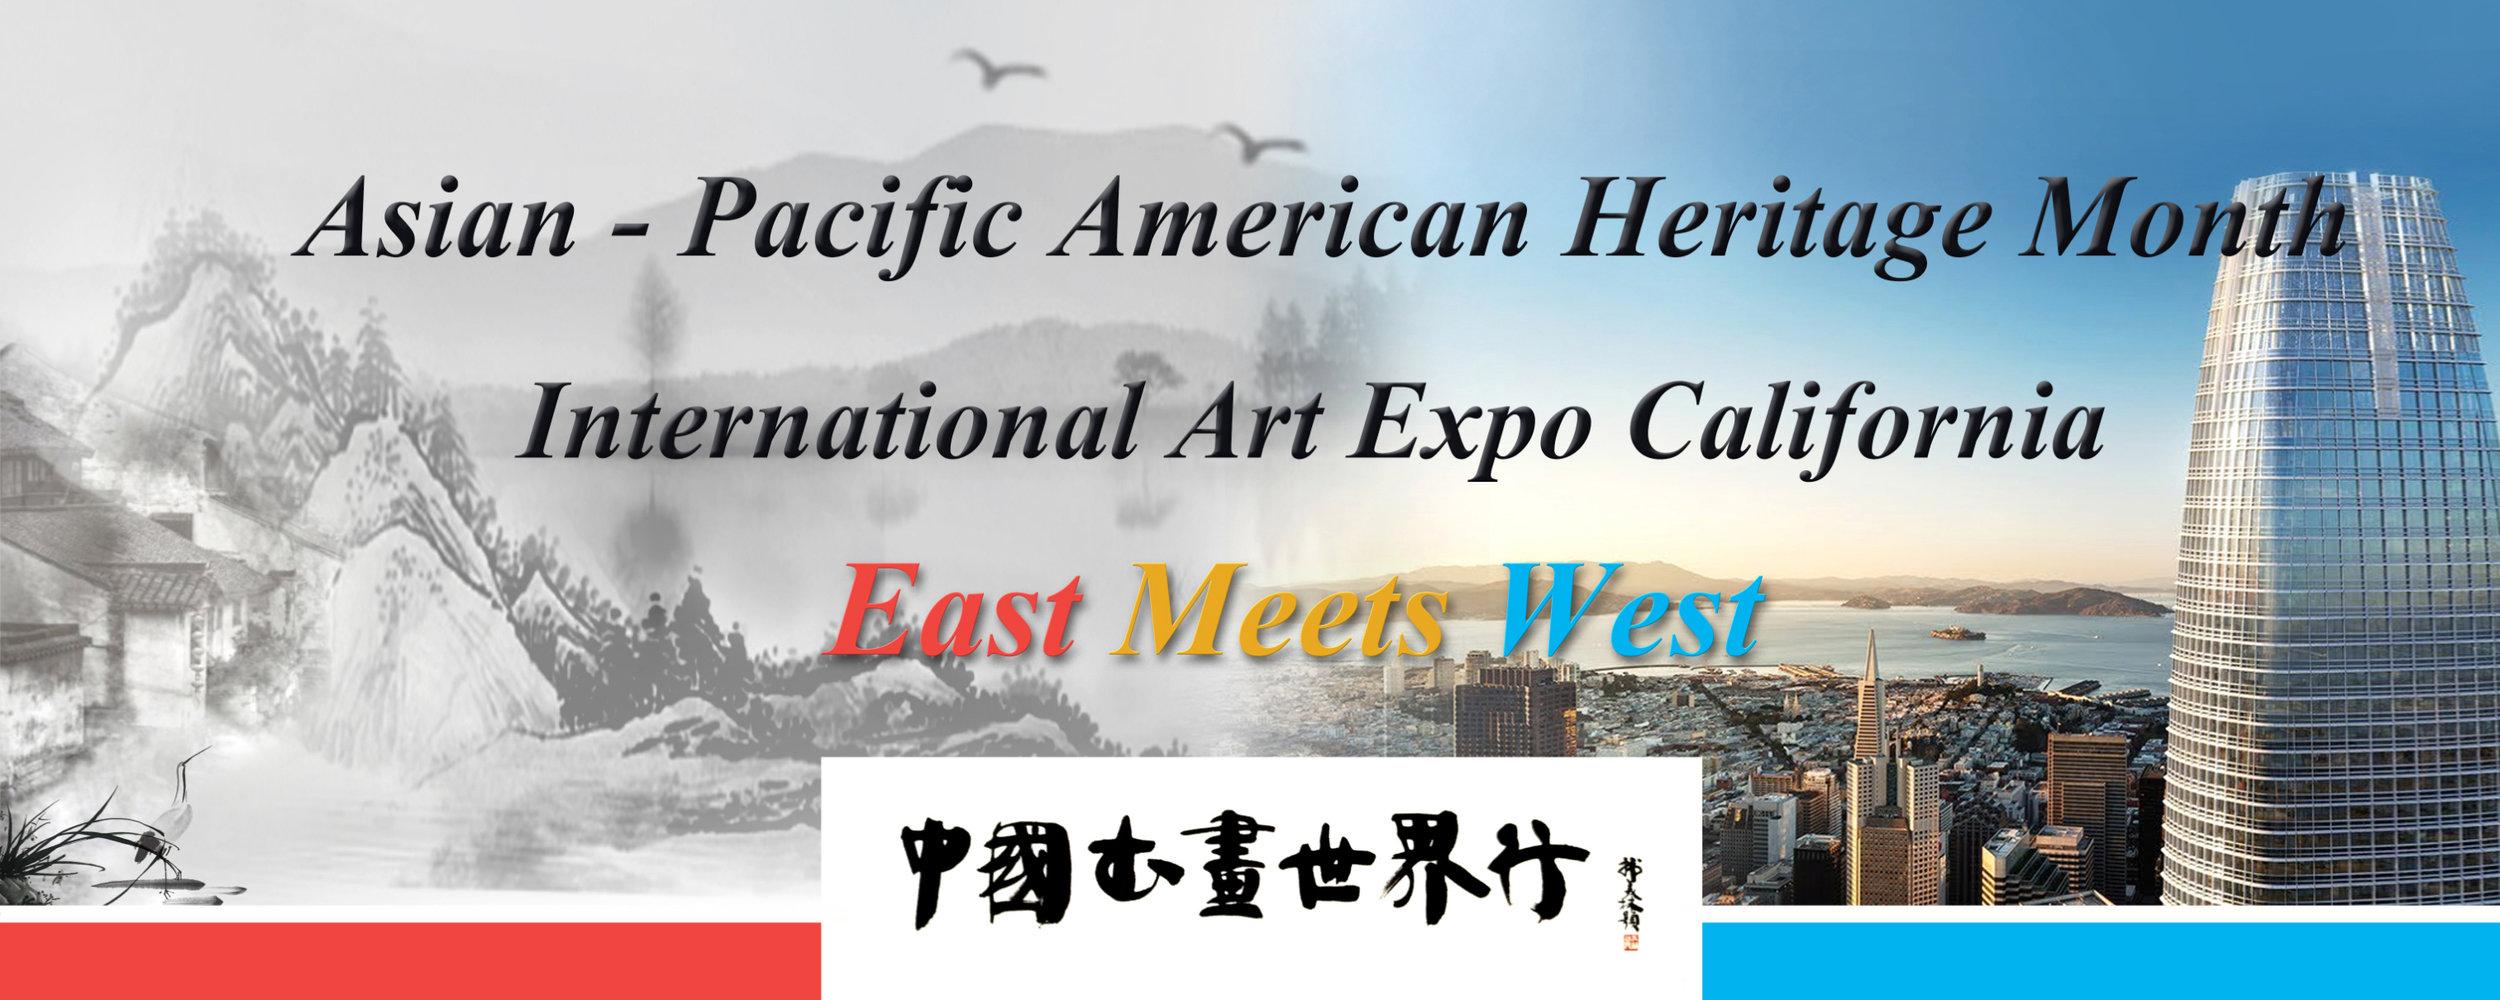 EMW-Event-背景.jpg